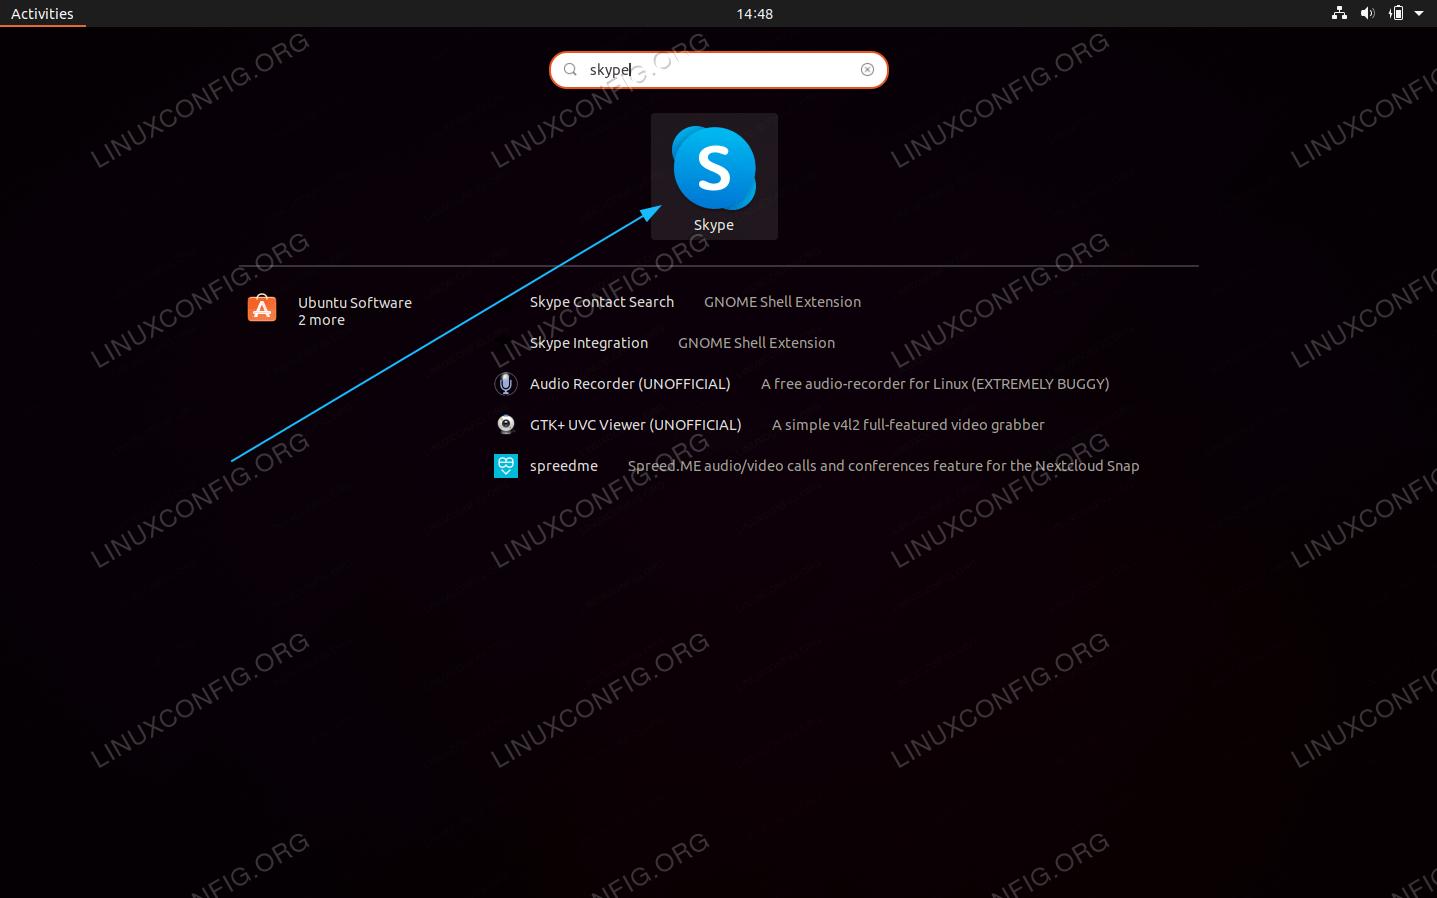 Start Skype on Ubuntu 20.04 Focal Fossa Linux